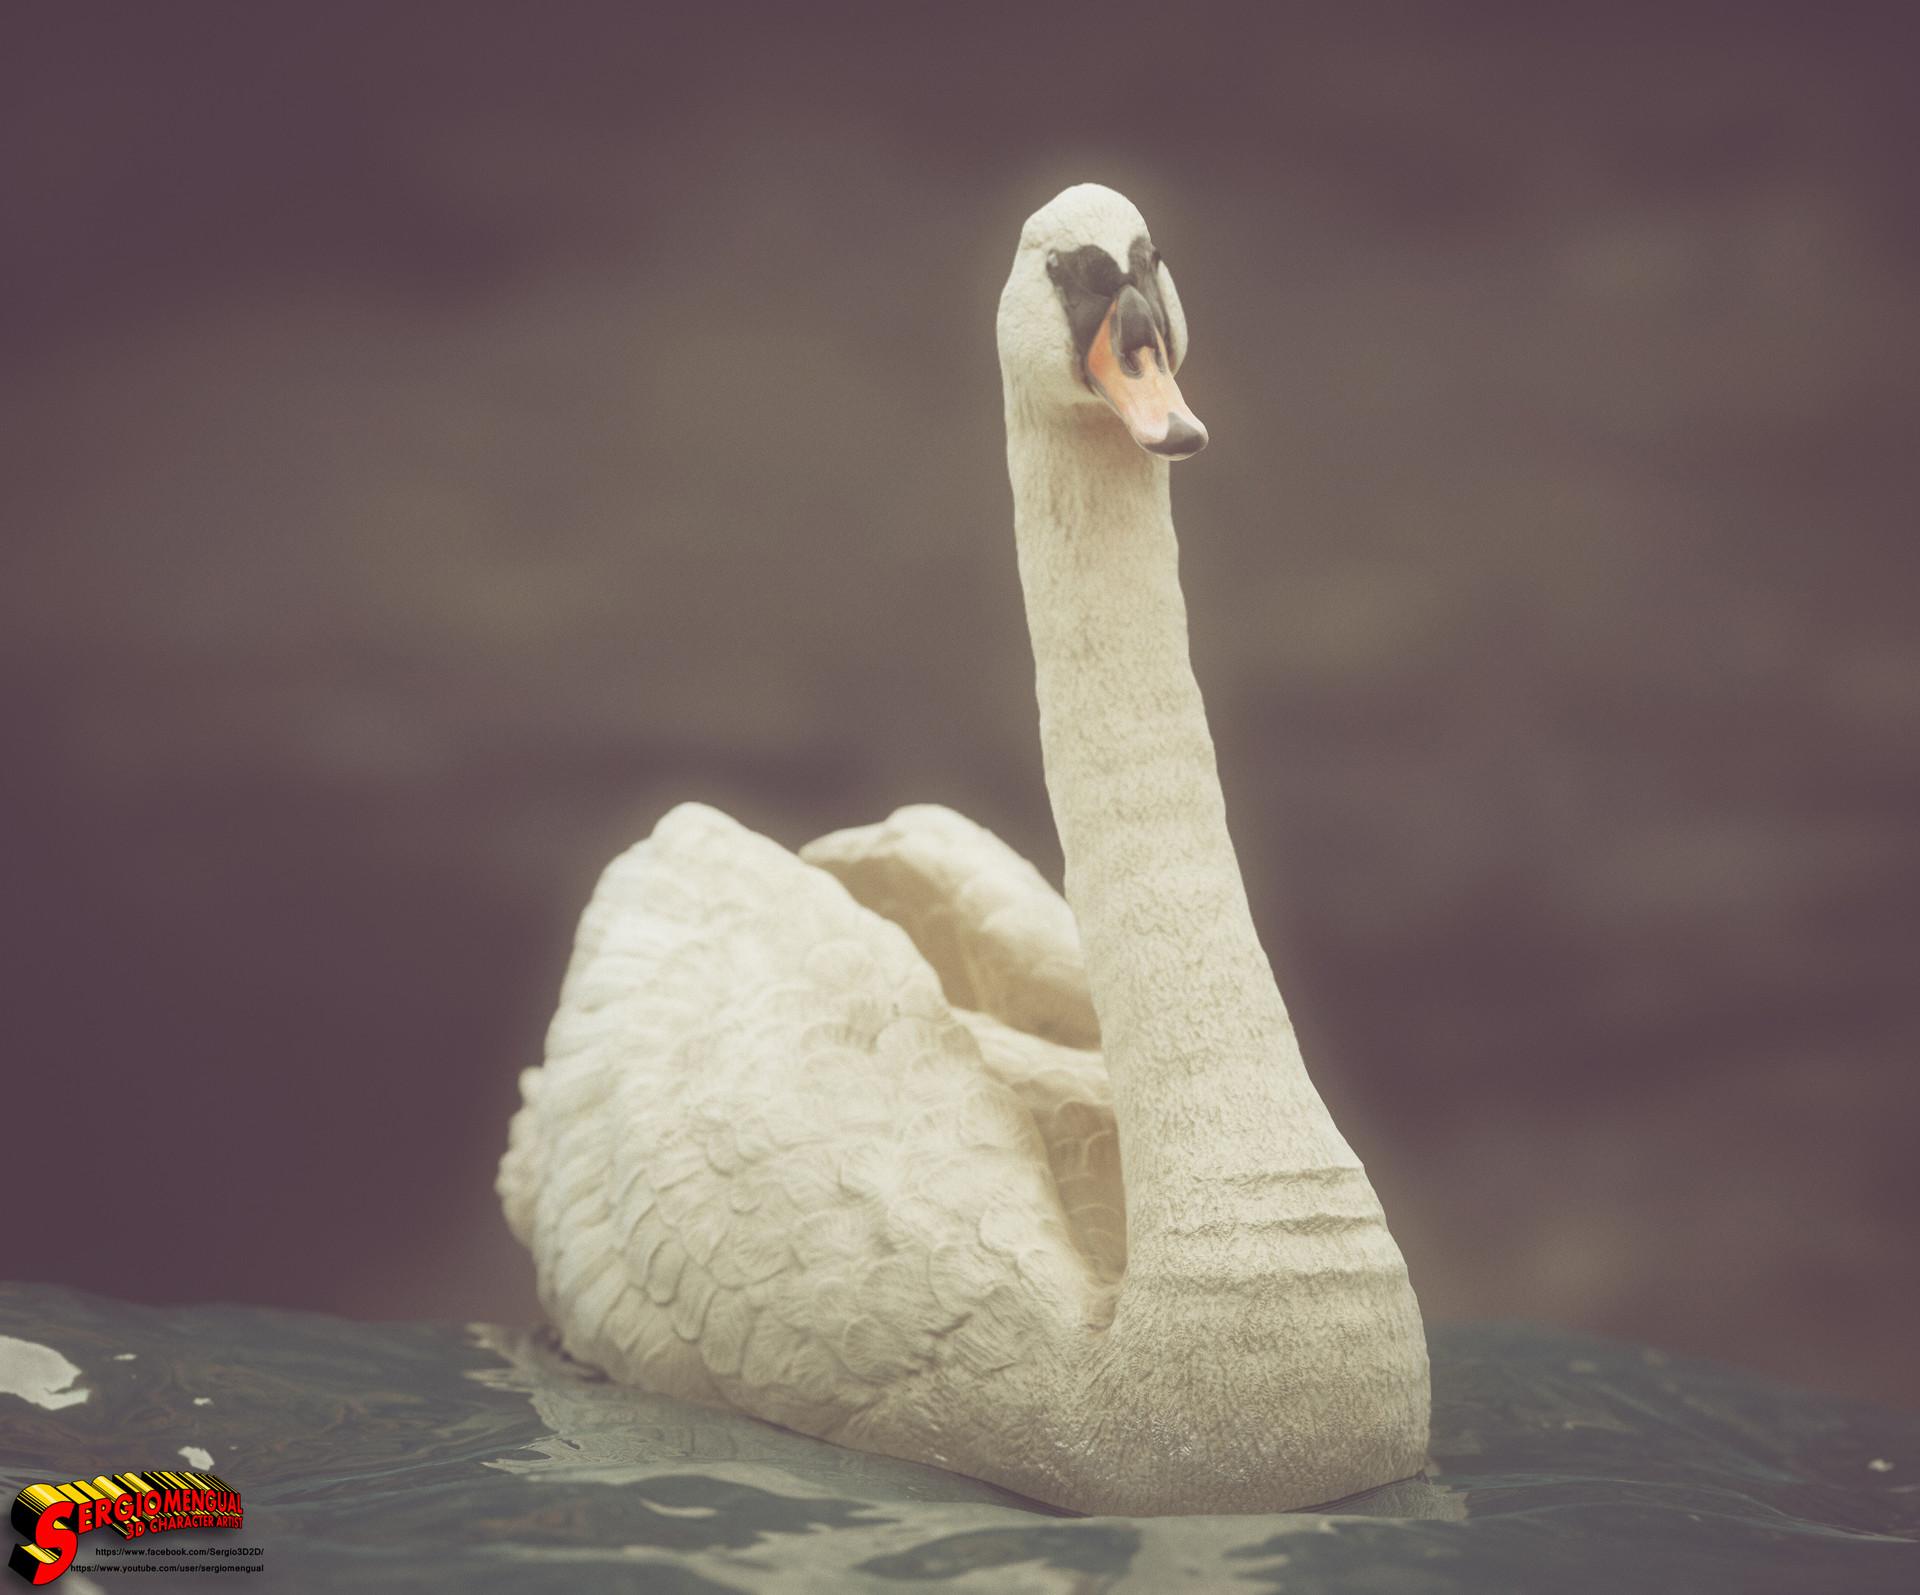 Sergio gabriel mengual swan square 11